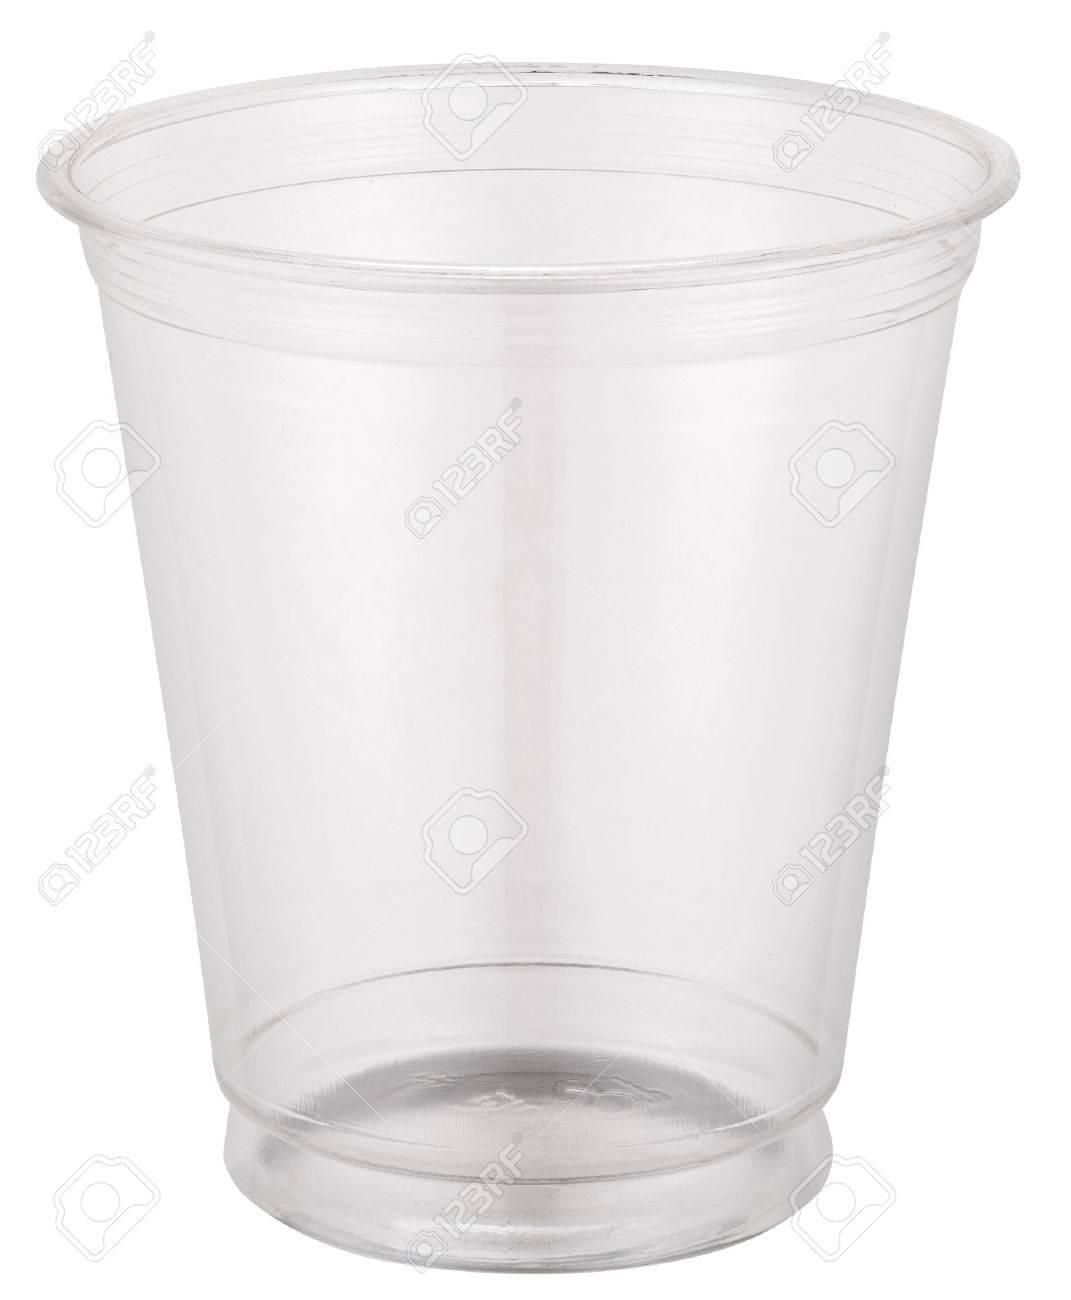 Empty plastic cup. Standard-Bild - 47443046